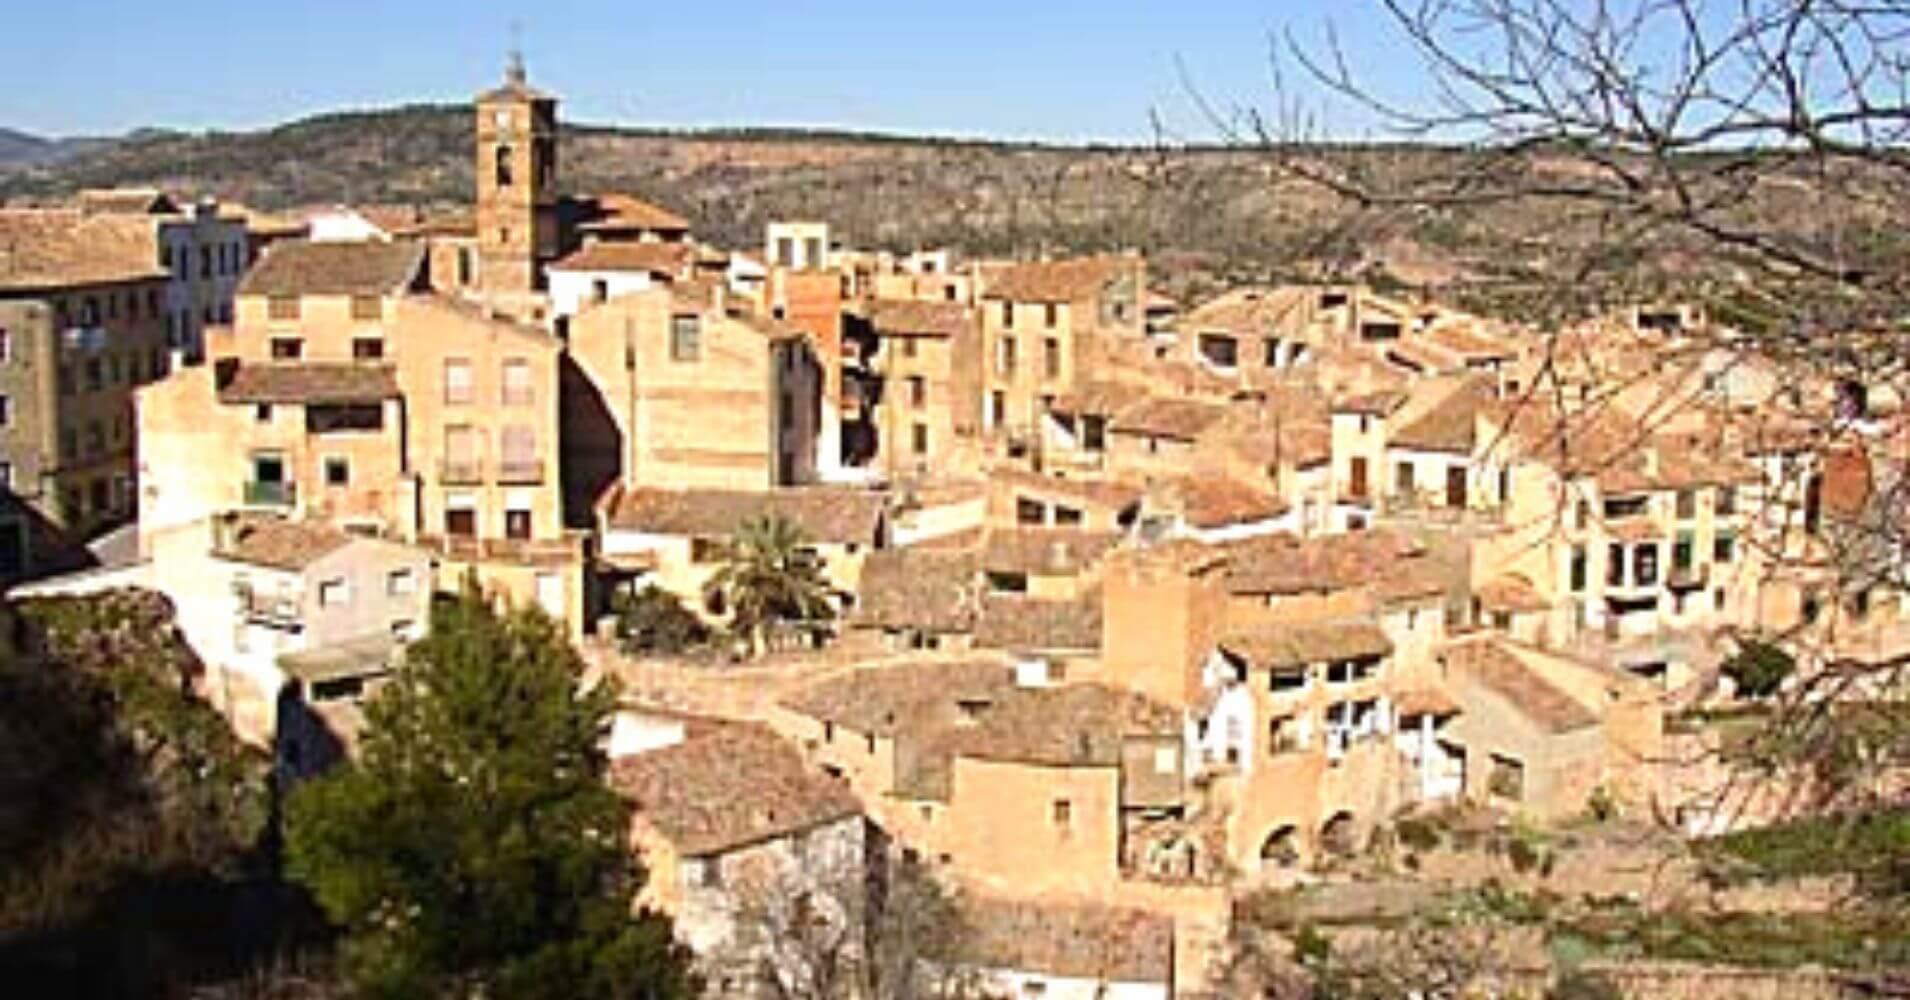 Letur. Albacete, Castilla la Mancha.